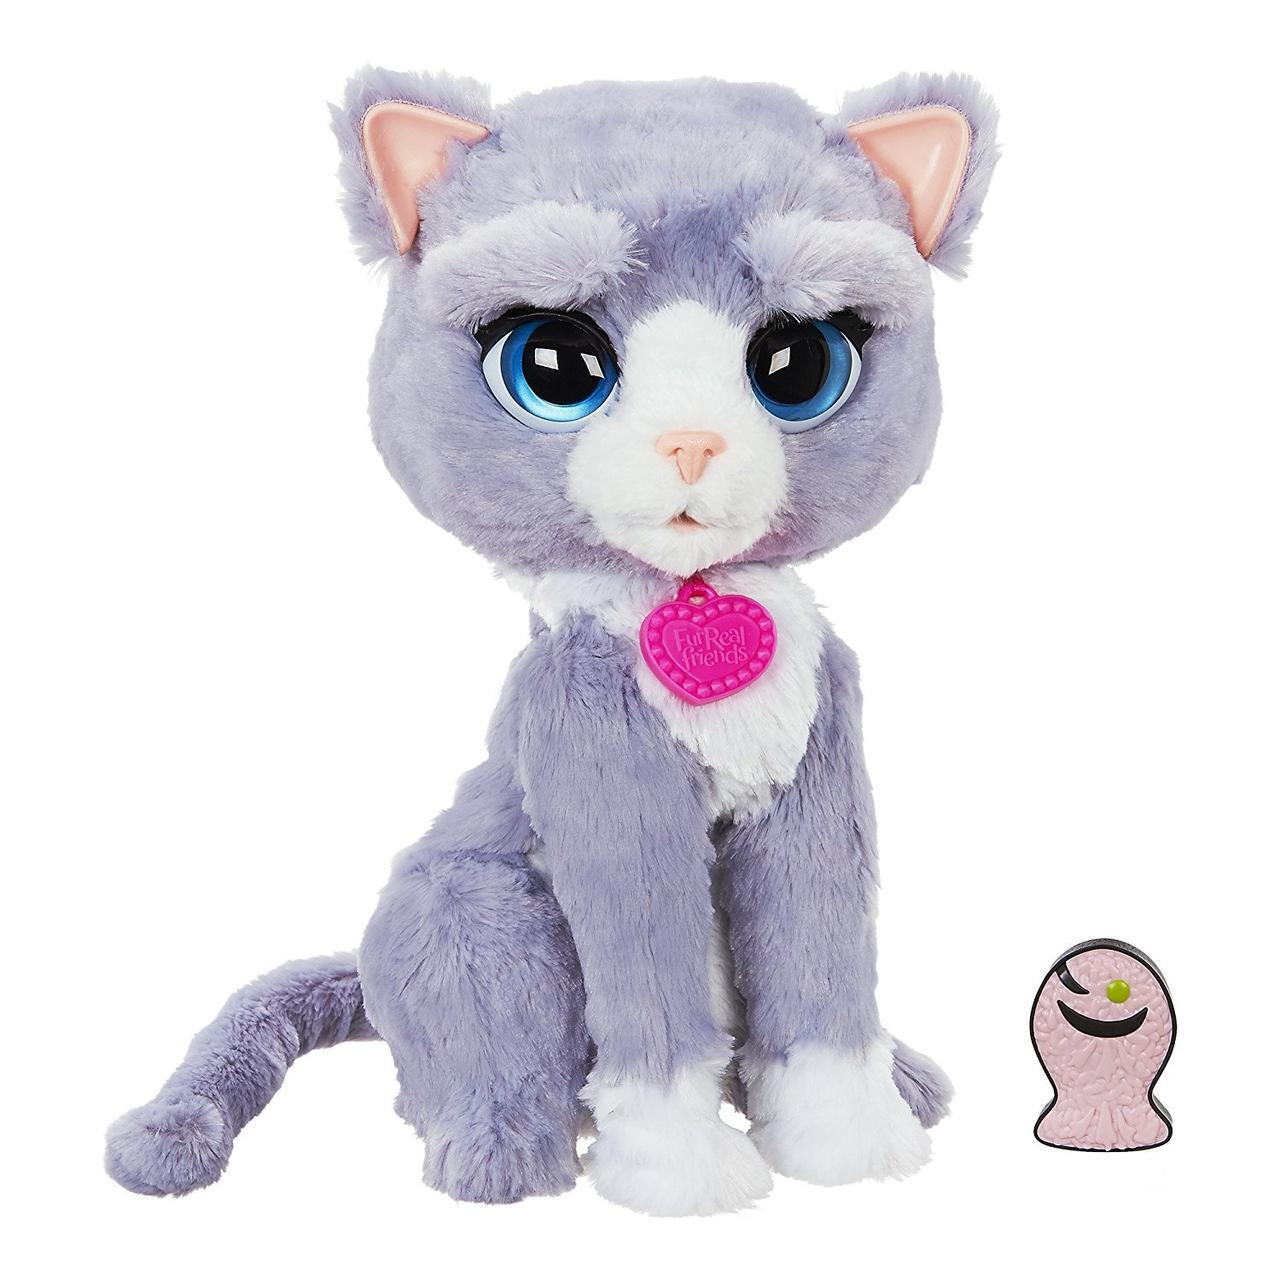 Интерактивный котенок Бутси Furreal Friends The Cat Bootsie от Hasbro